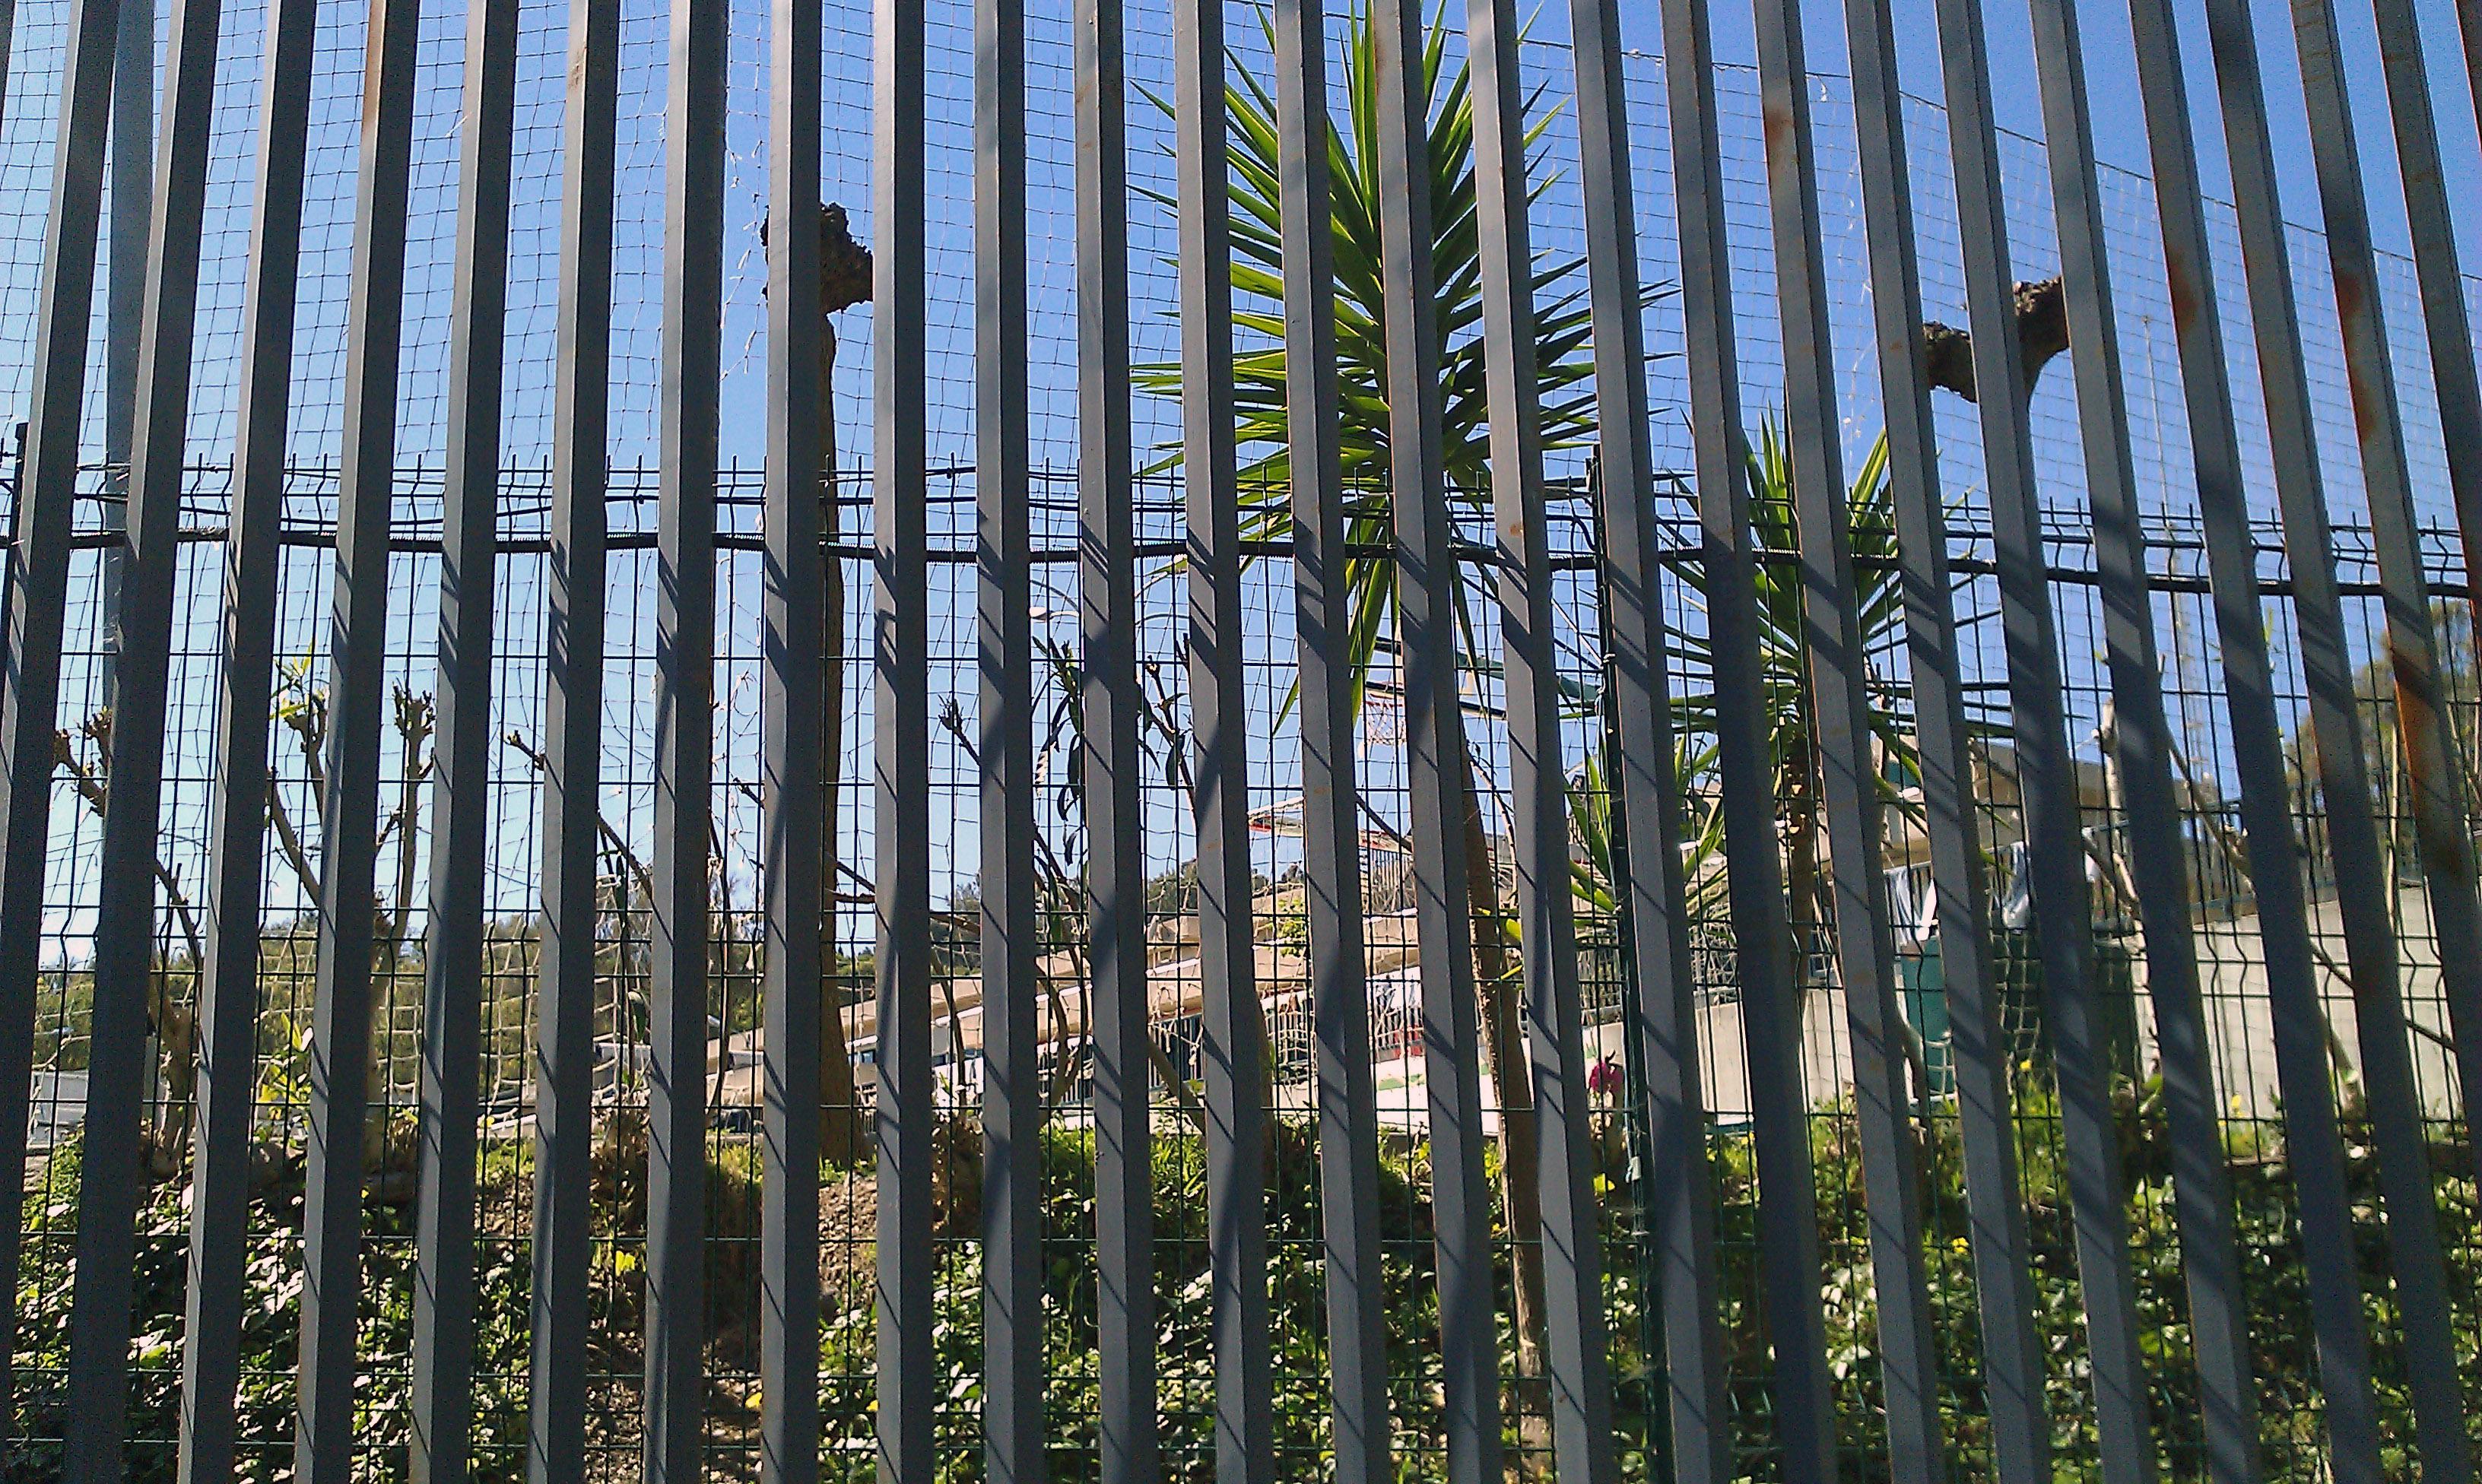 CETI immigration holding centre in Ceuta